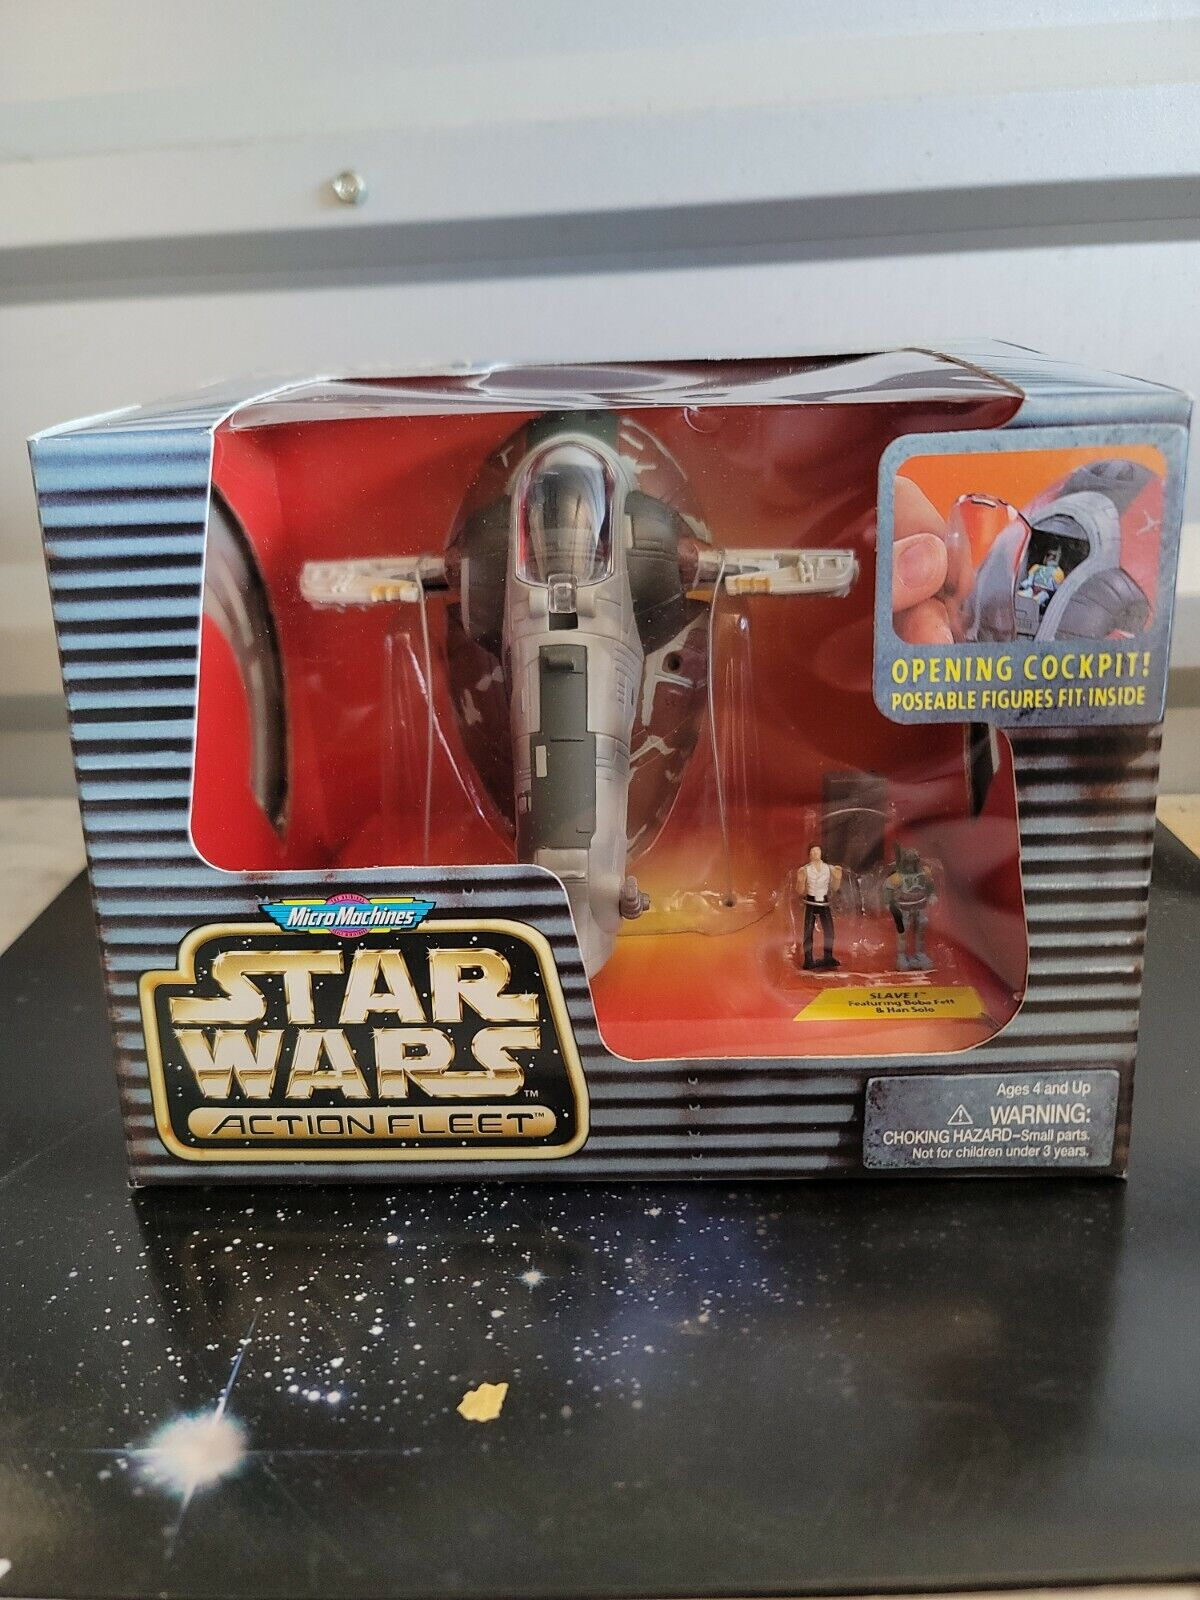 Micro Machines Star Wars Action Fleet Boba Fett V2